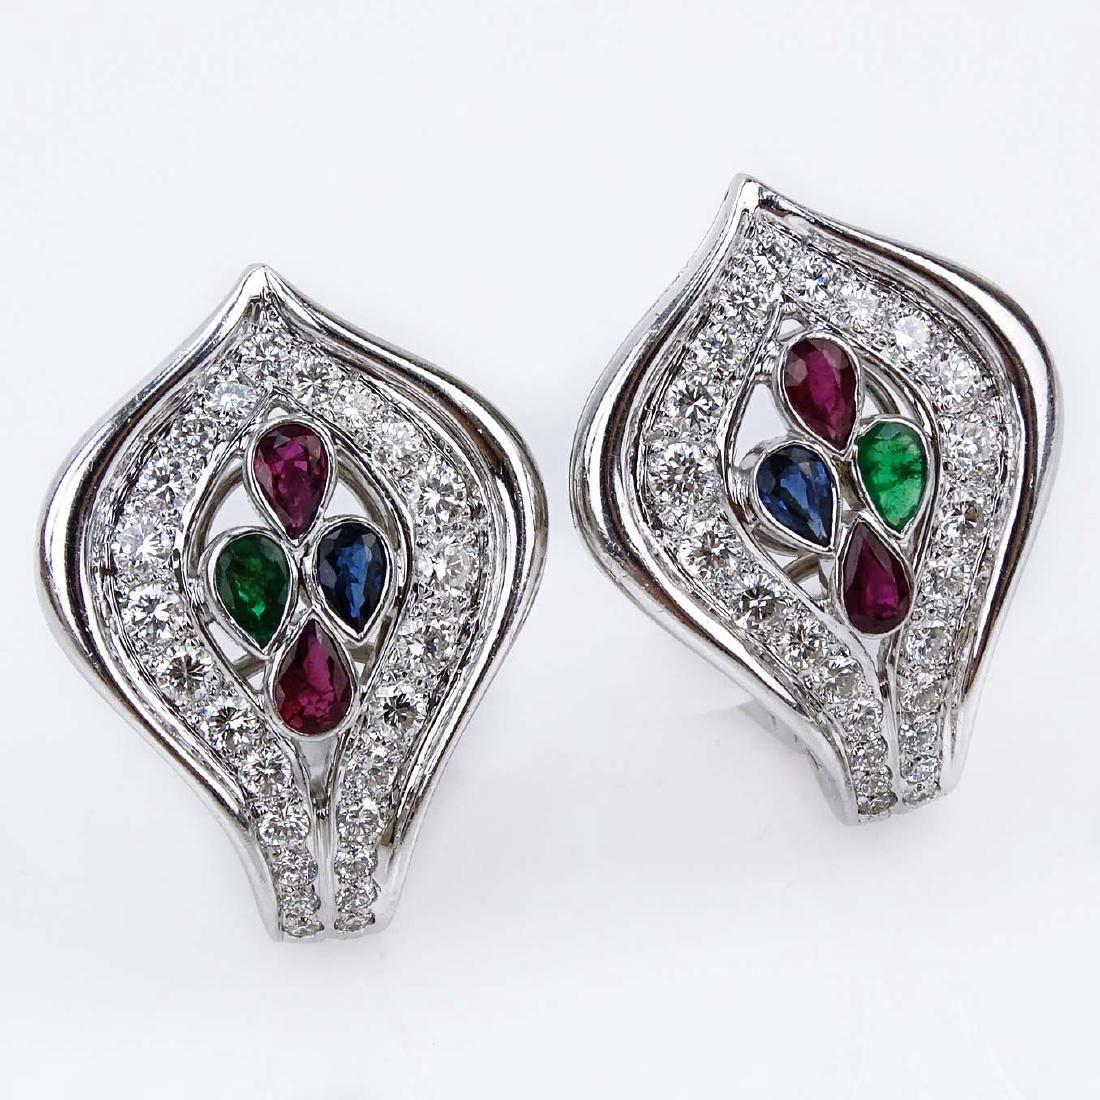 Cartier Diamond, Ruby, Emerald, Sapphire and 18 Karat